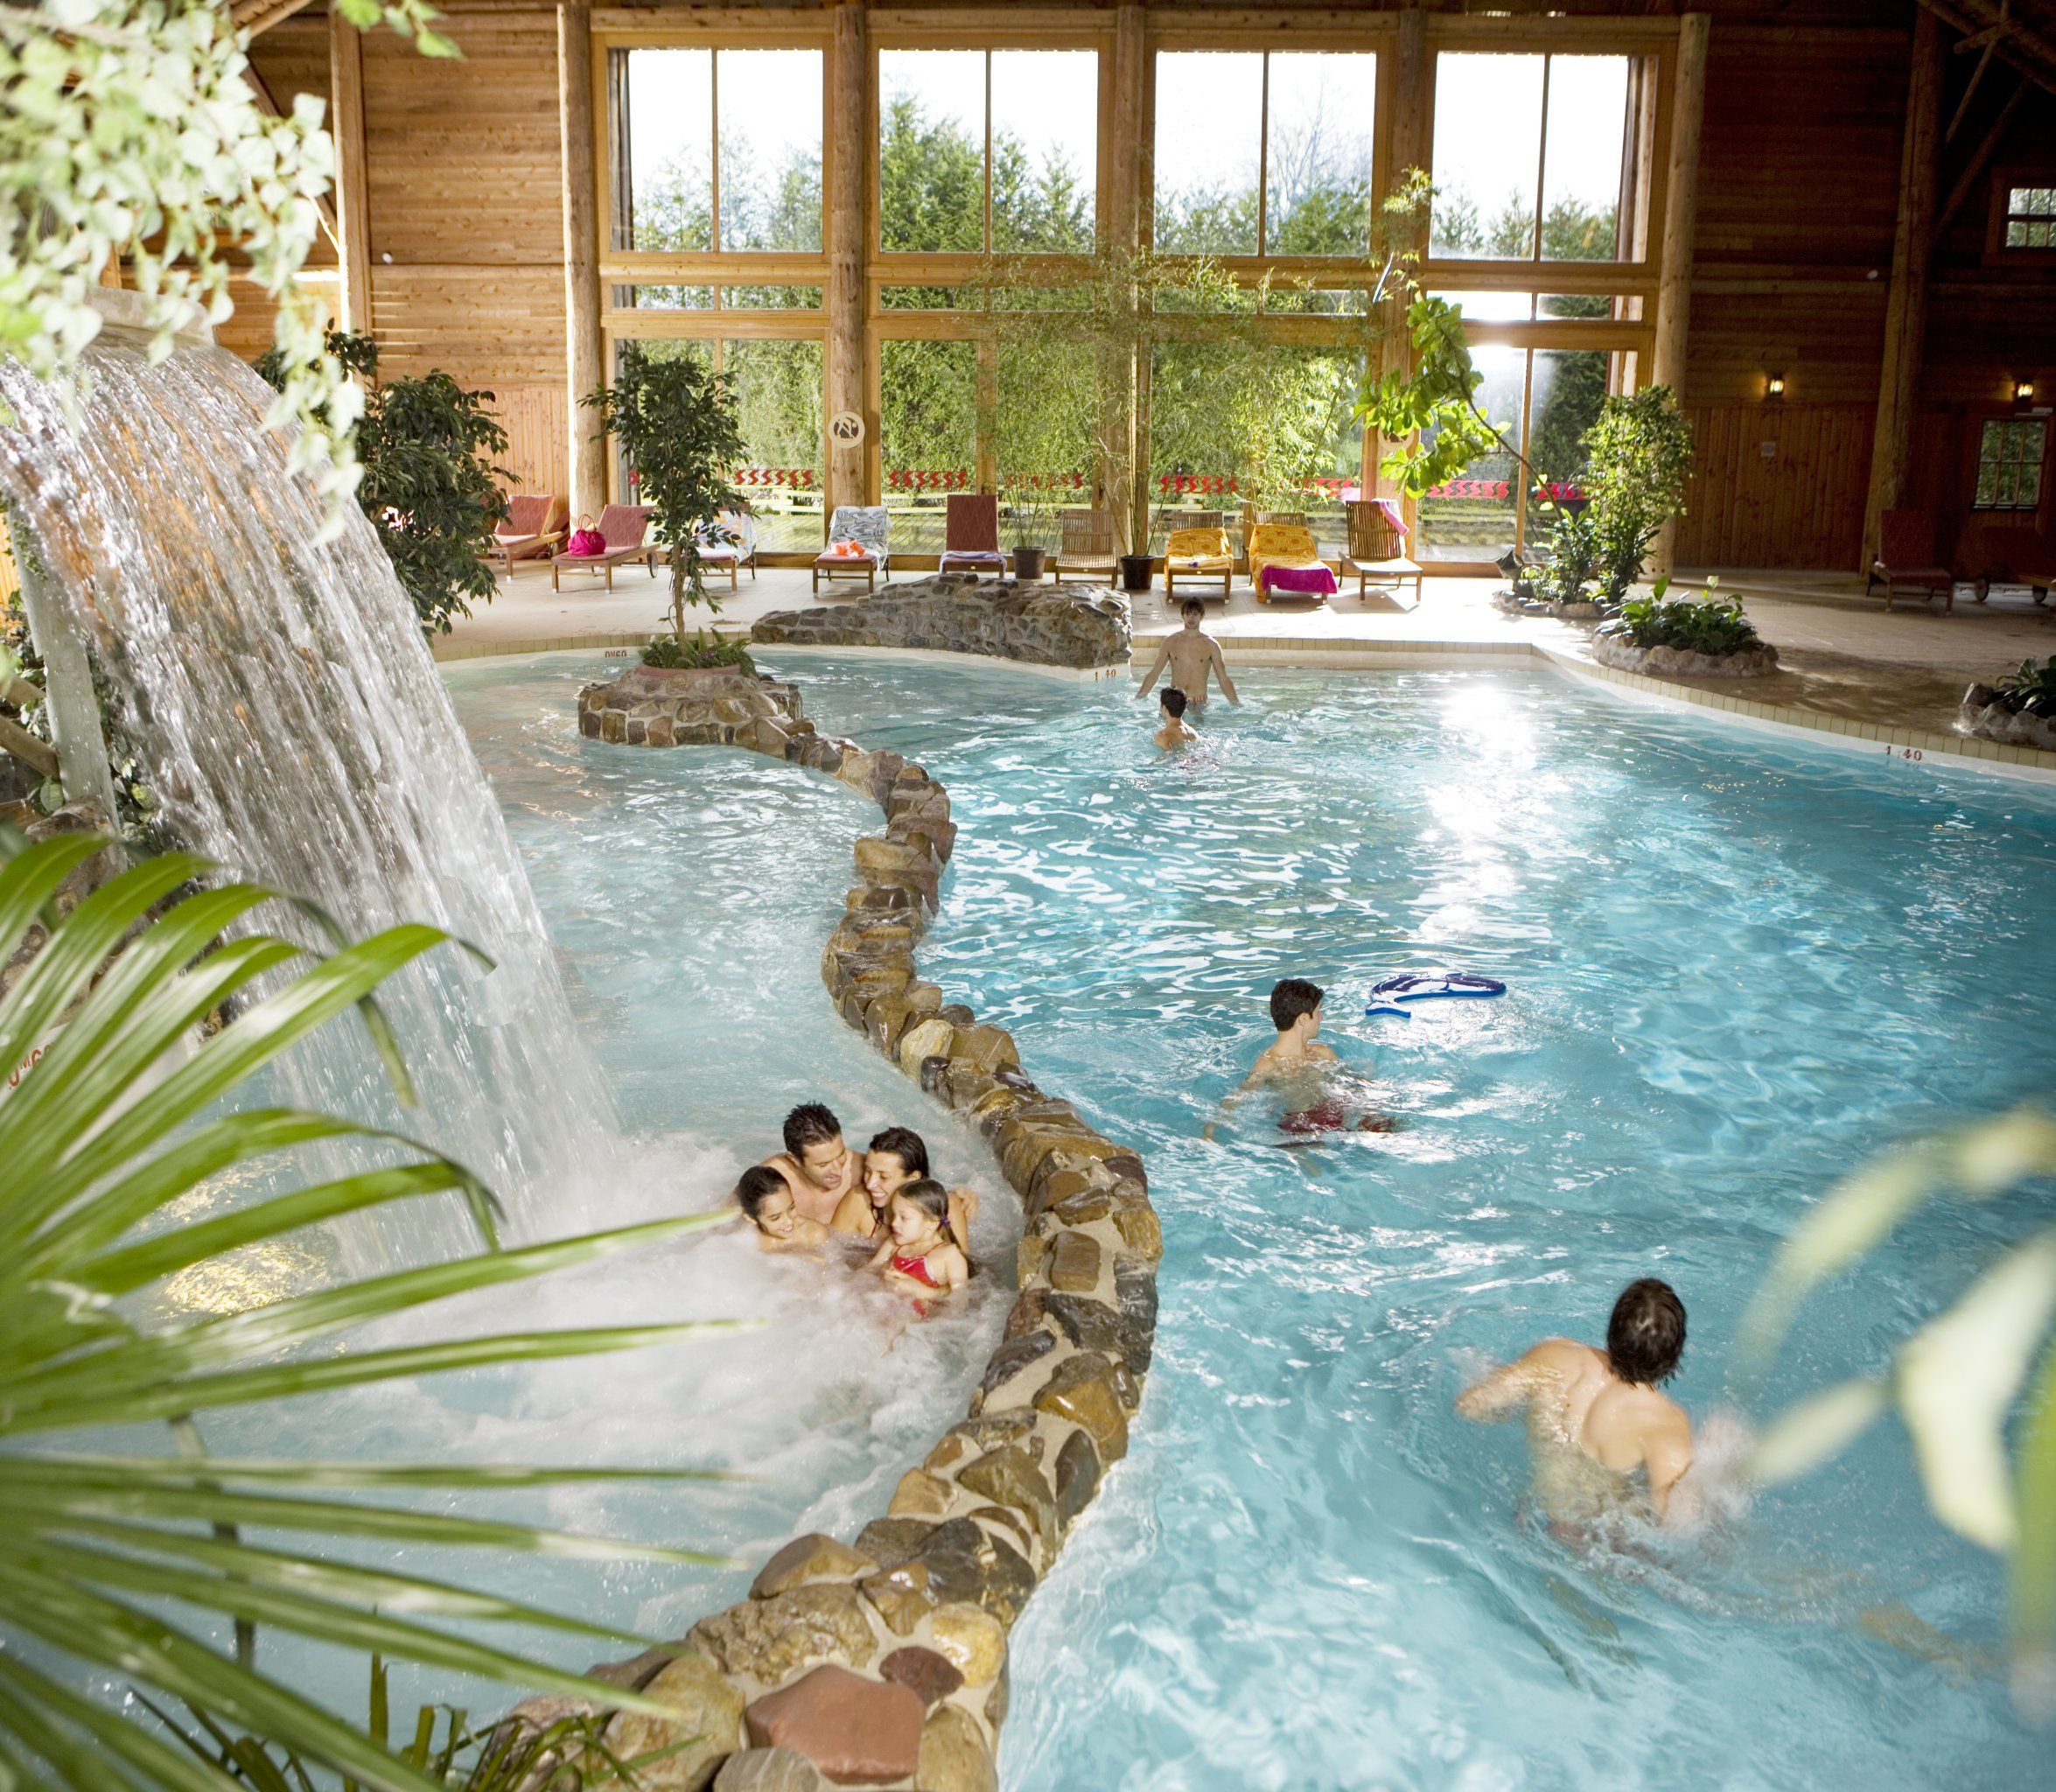 Disney Hotels, Davy Crockett Ranch - Indoor Pool, Disneyland ... tout Piscine Davy Crockett